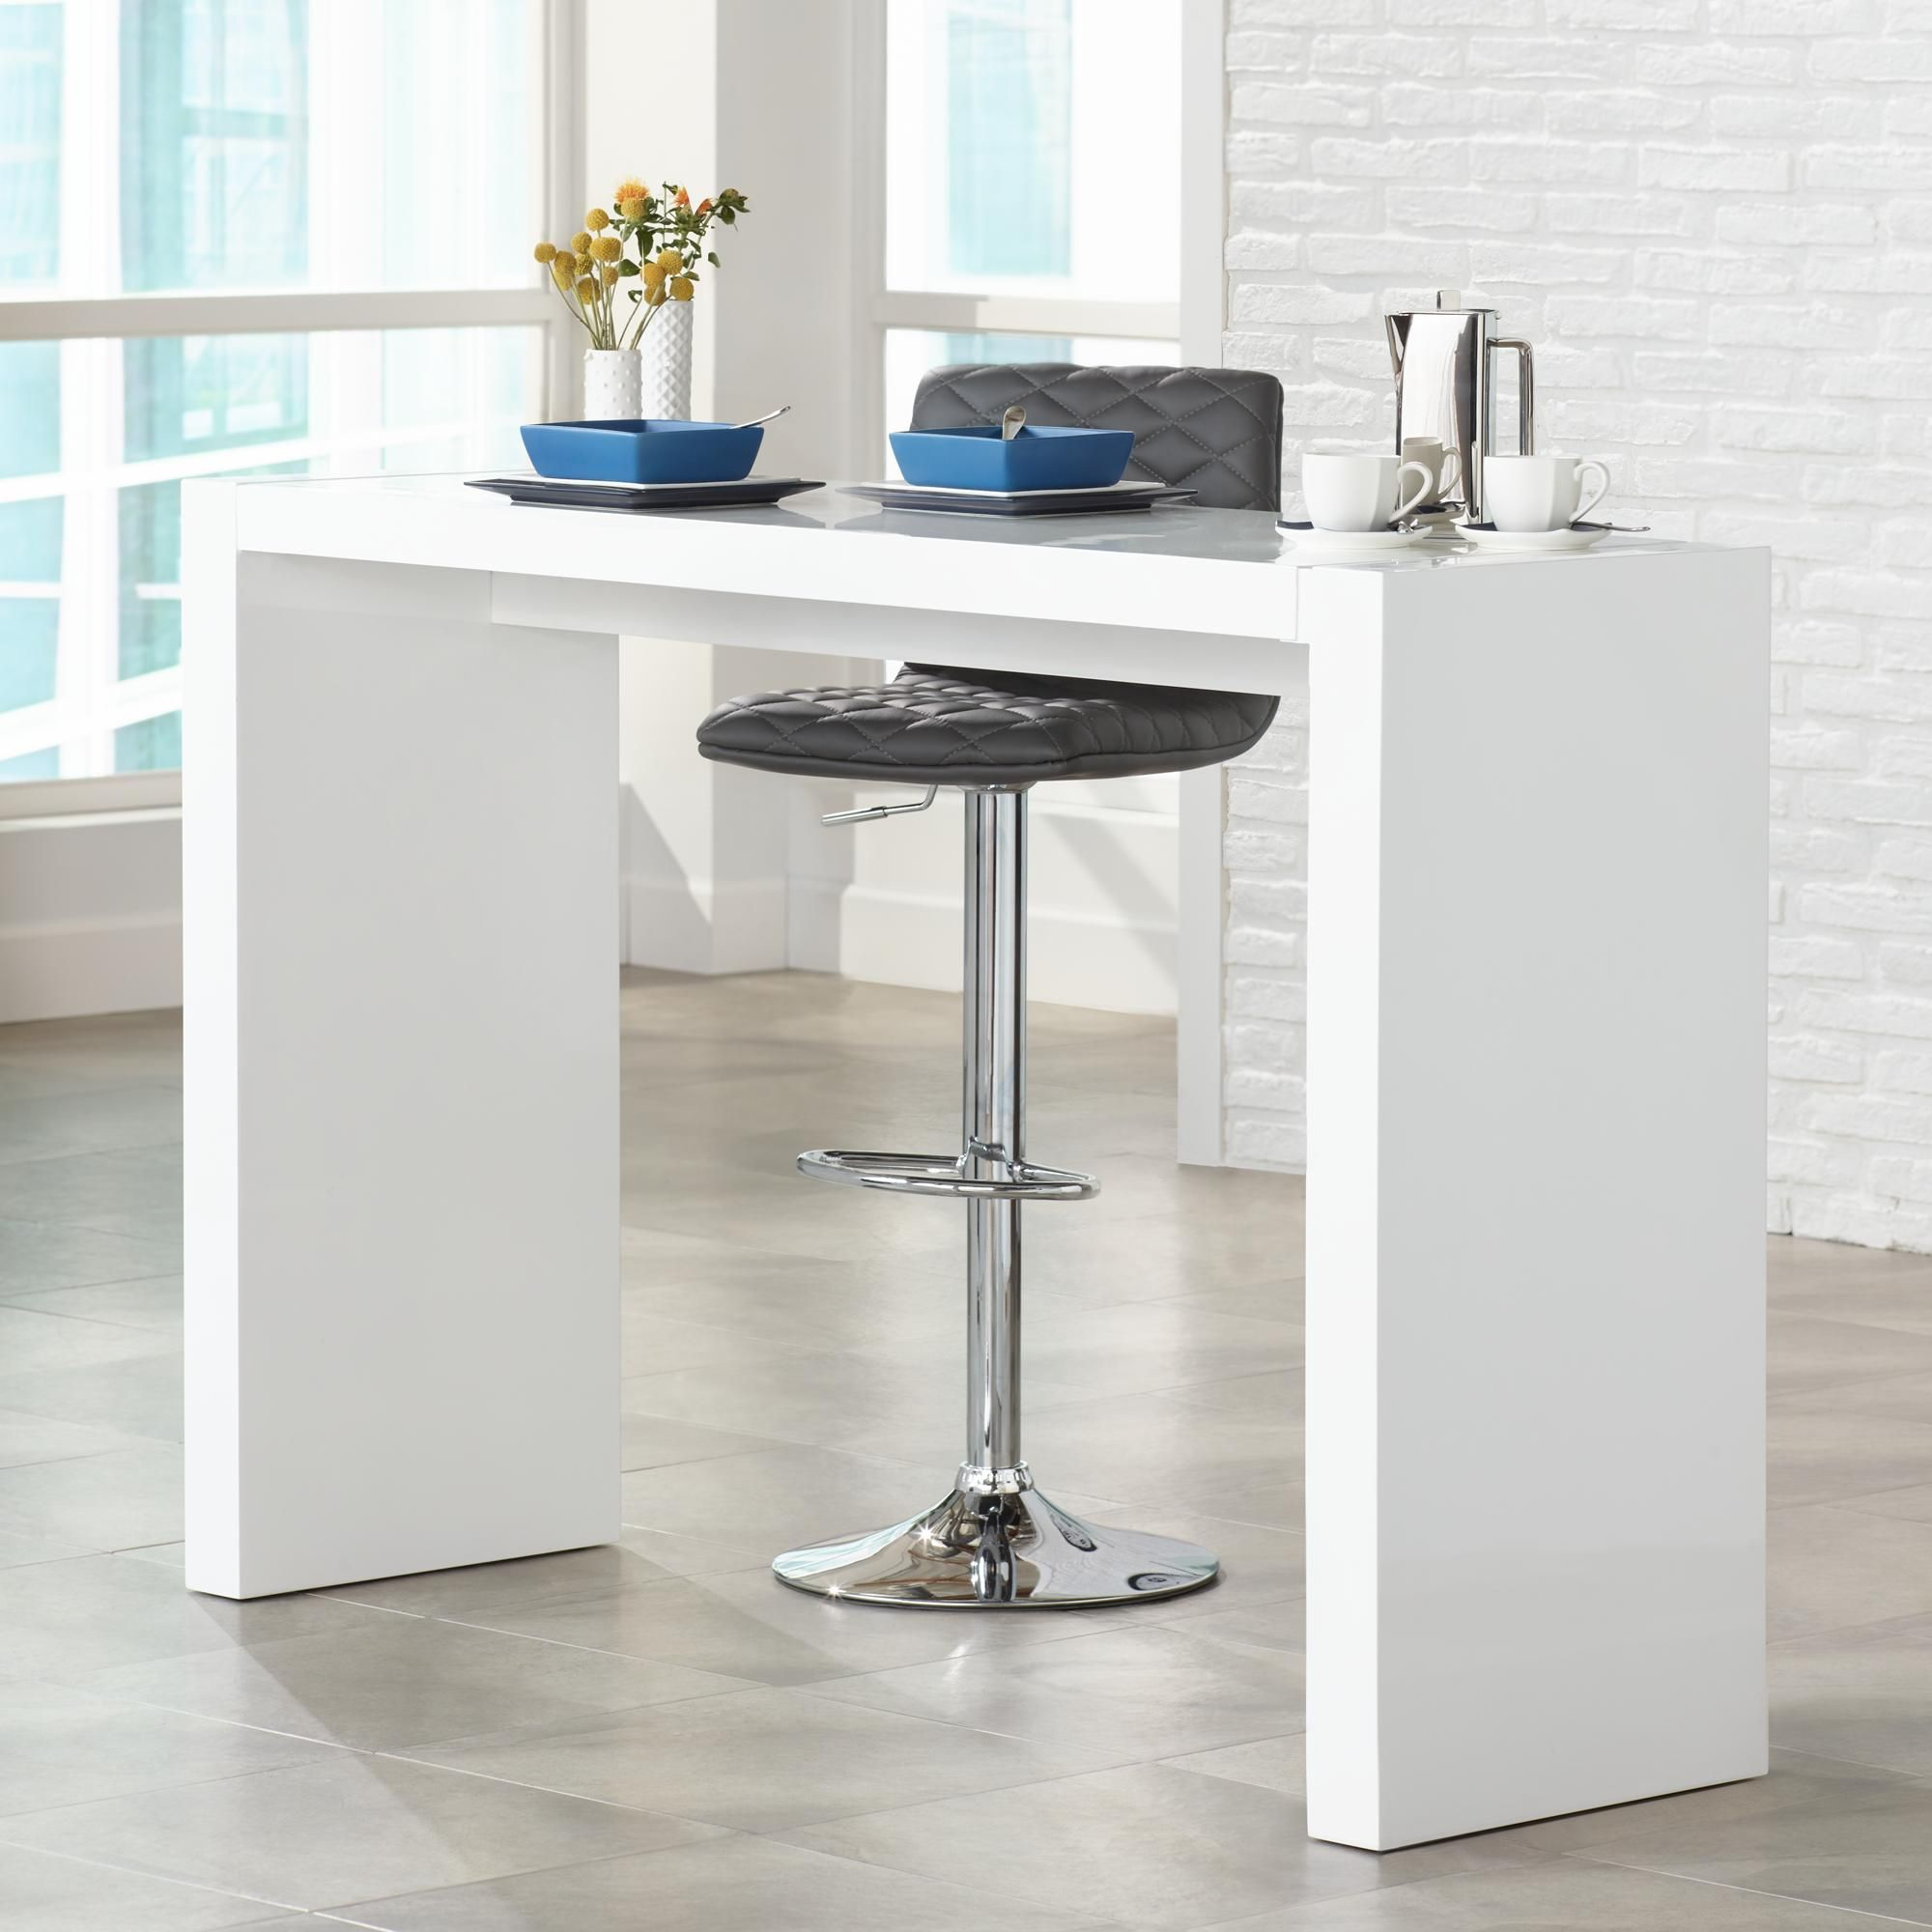 Tables Velia 60 Wide High Gloss White Modern Bar Table Modern Bar Table White Bar Table Home Bar Table